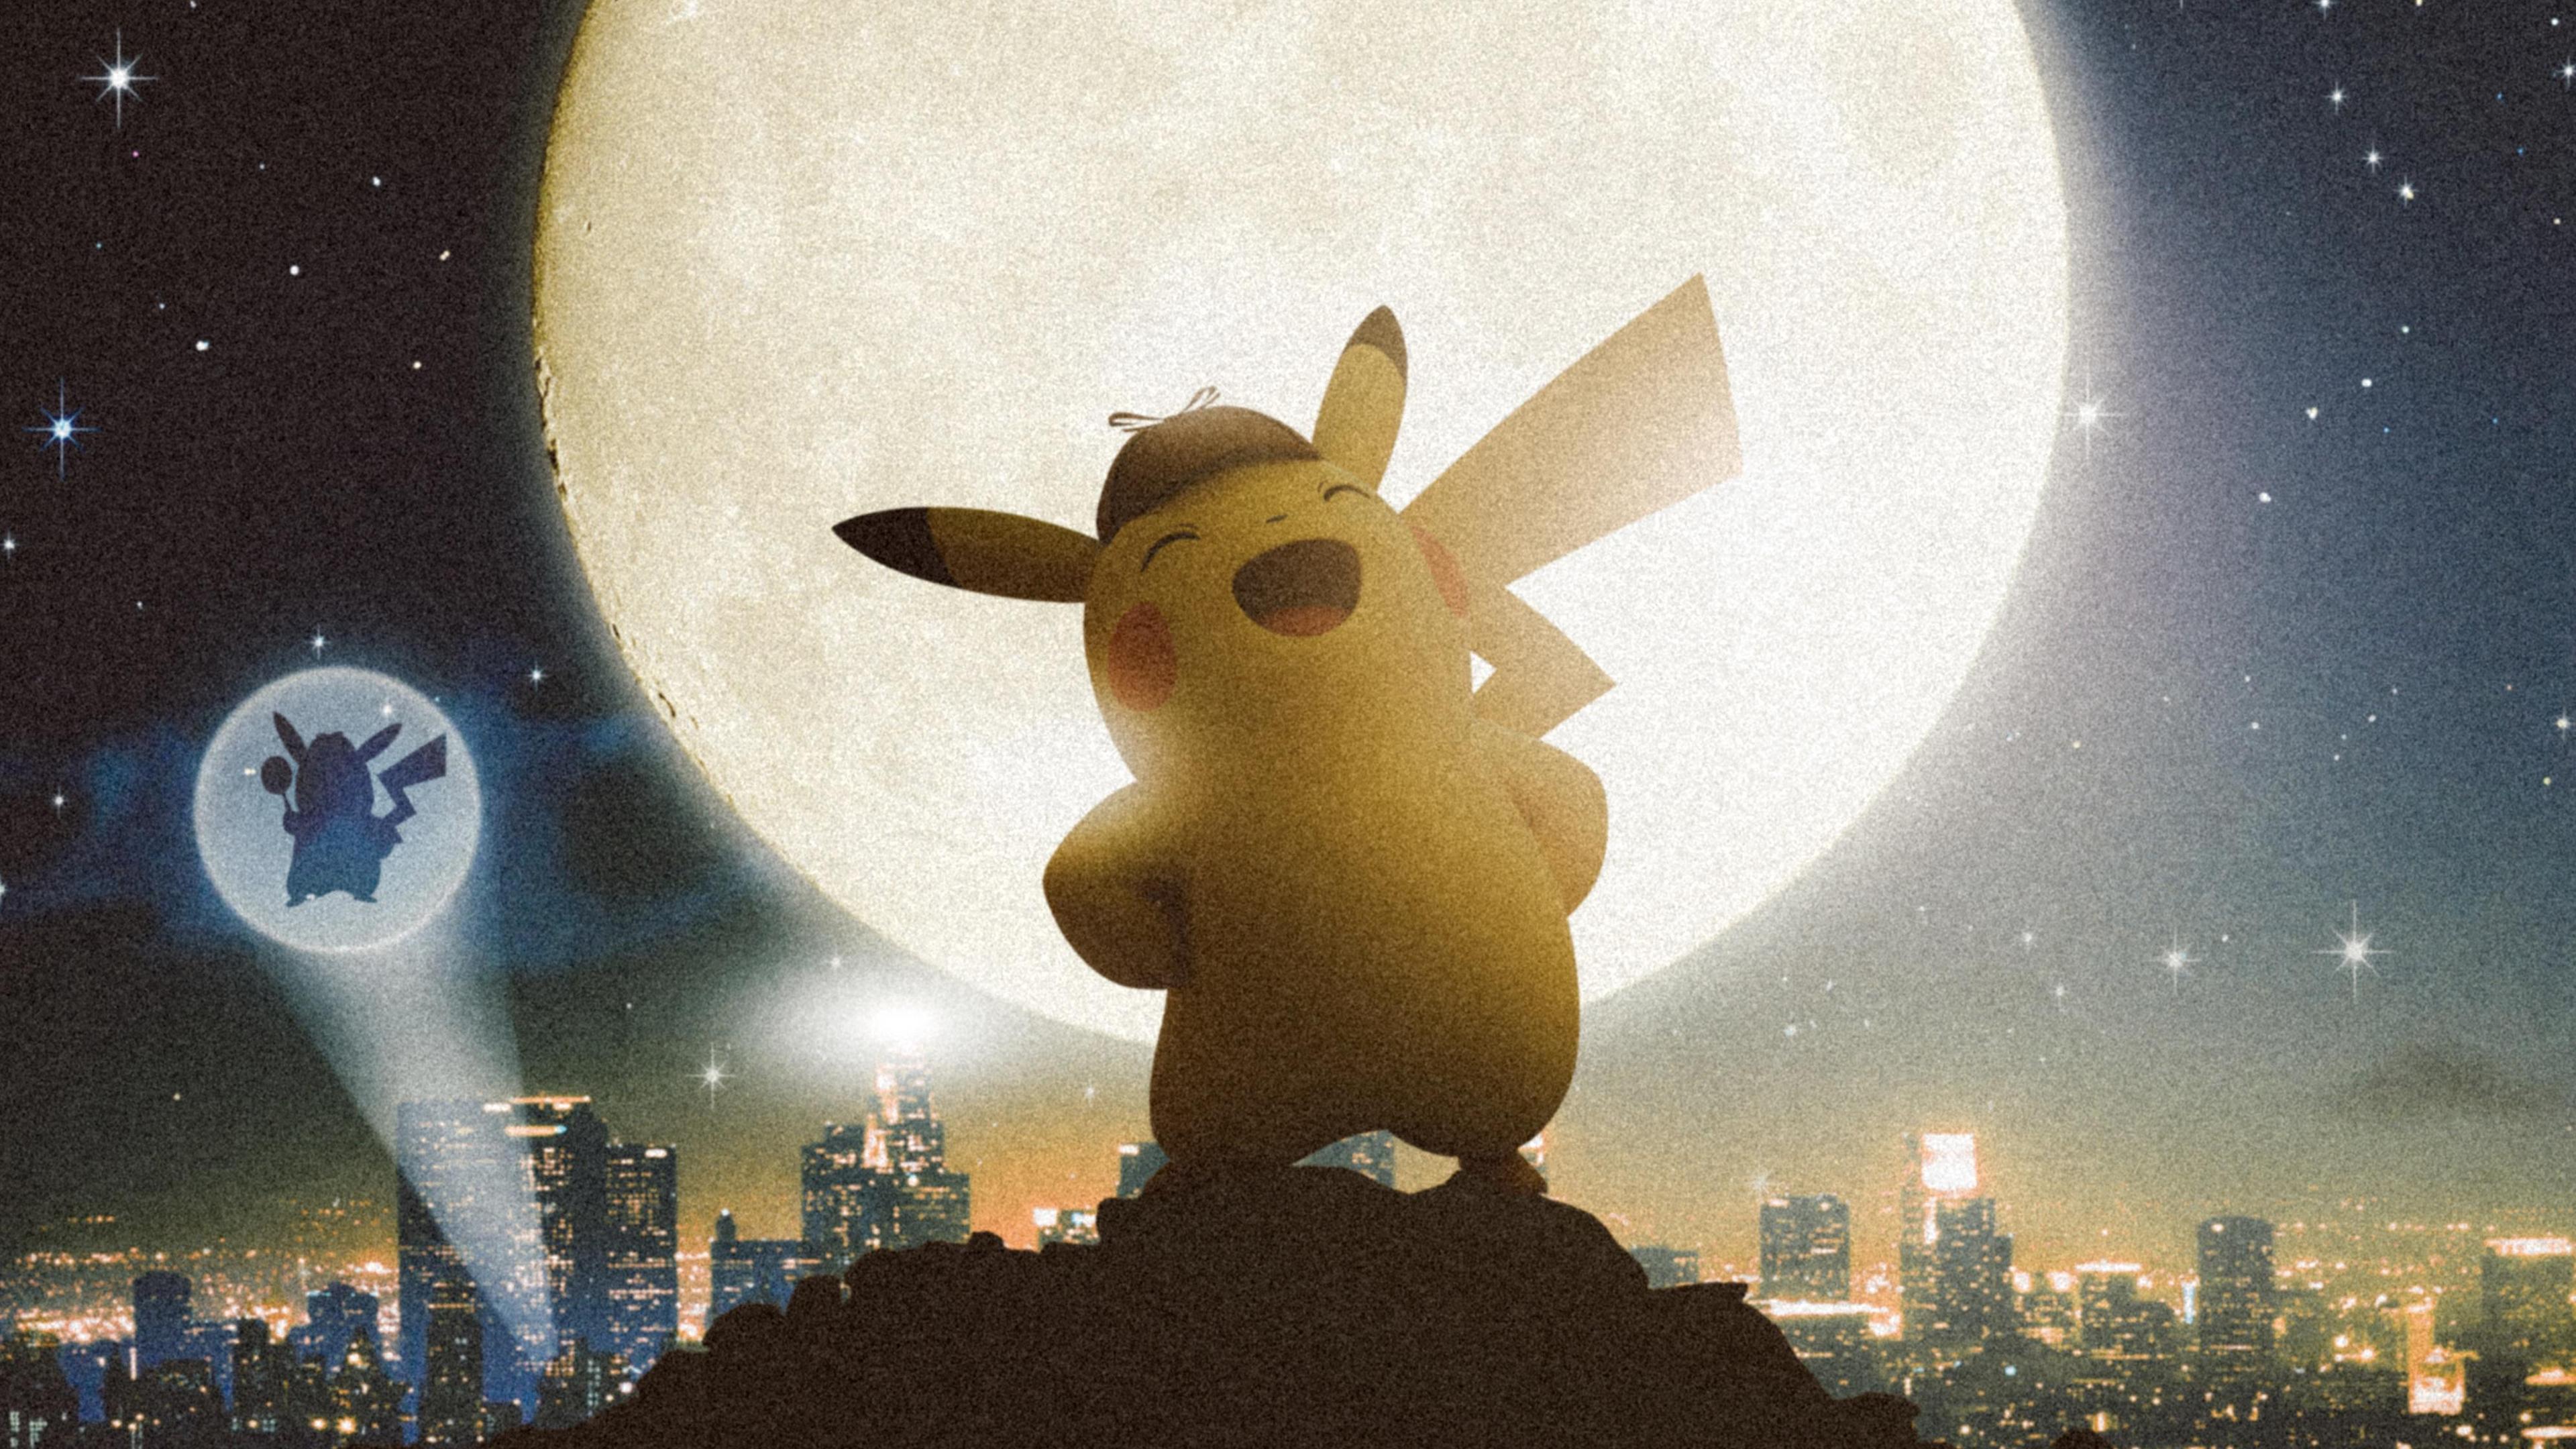 Wallpaper 4k Detective Pikachu 4k 2019 Movies Wallpapers 4k